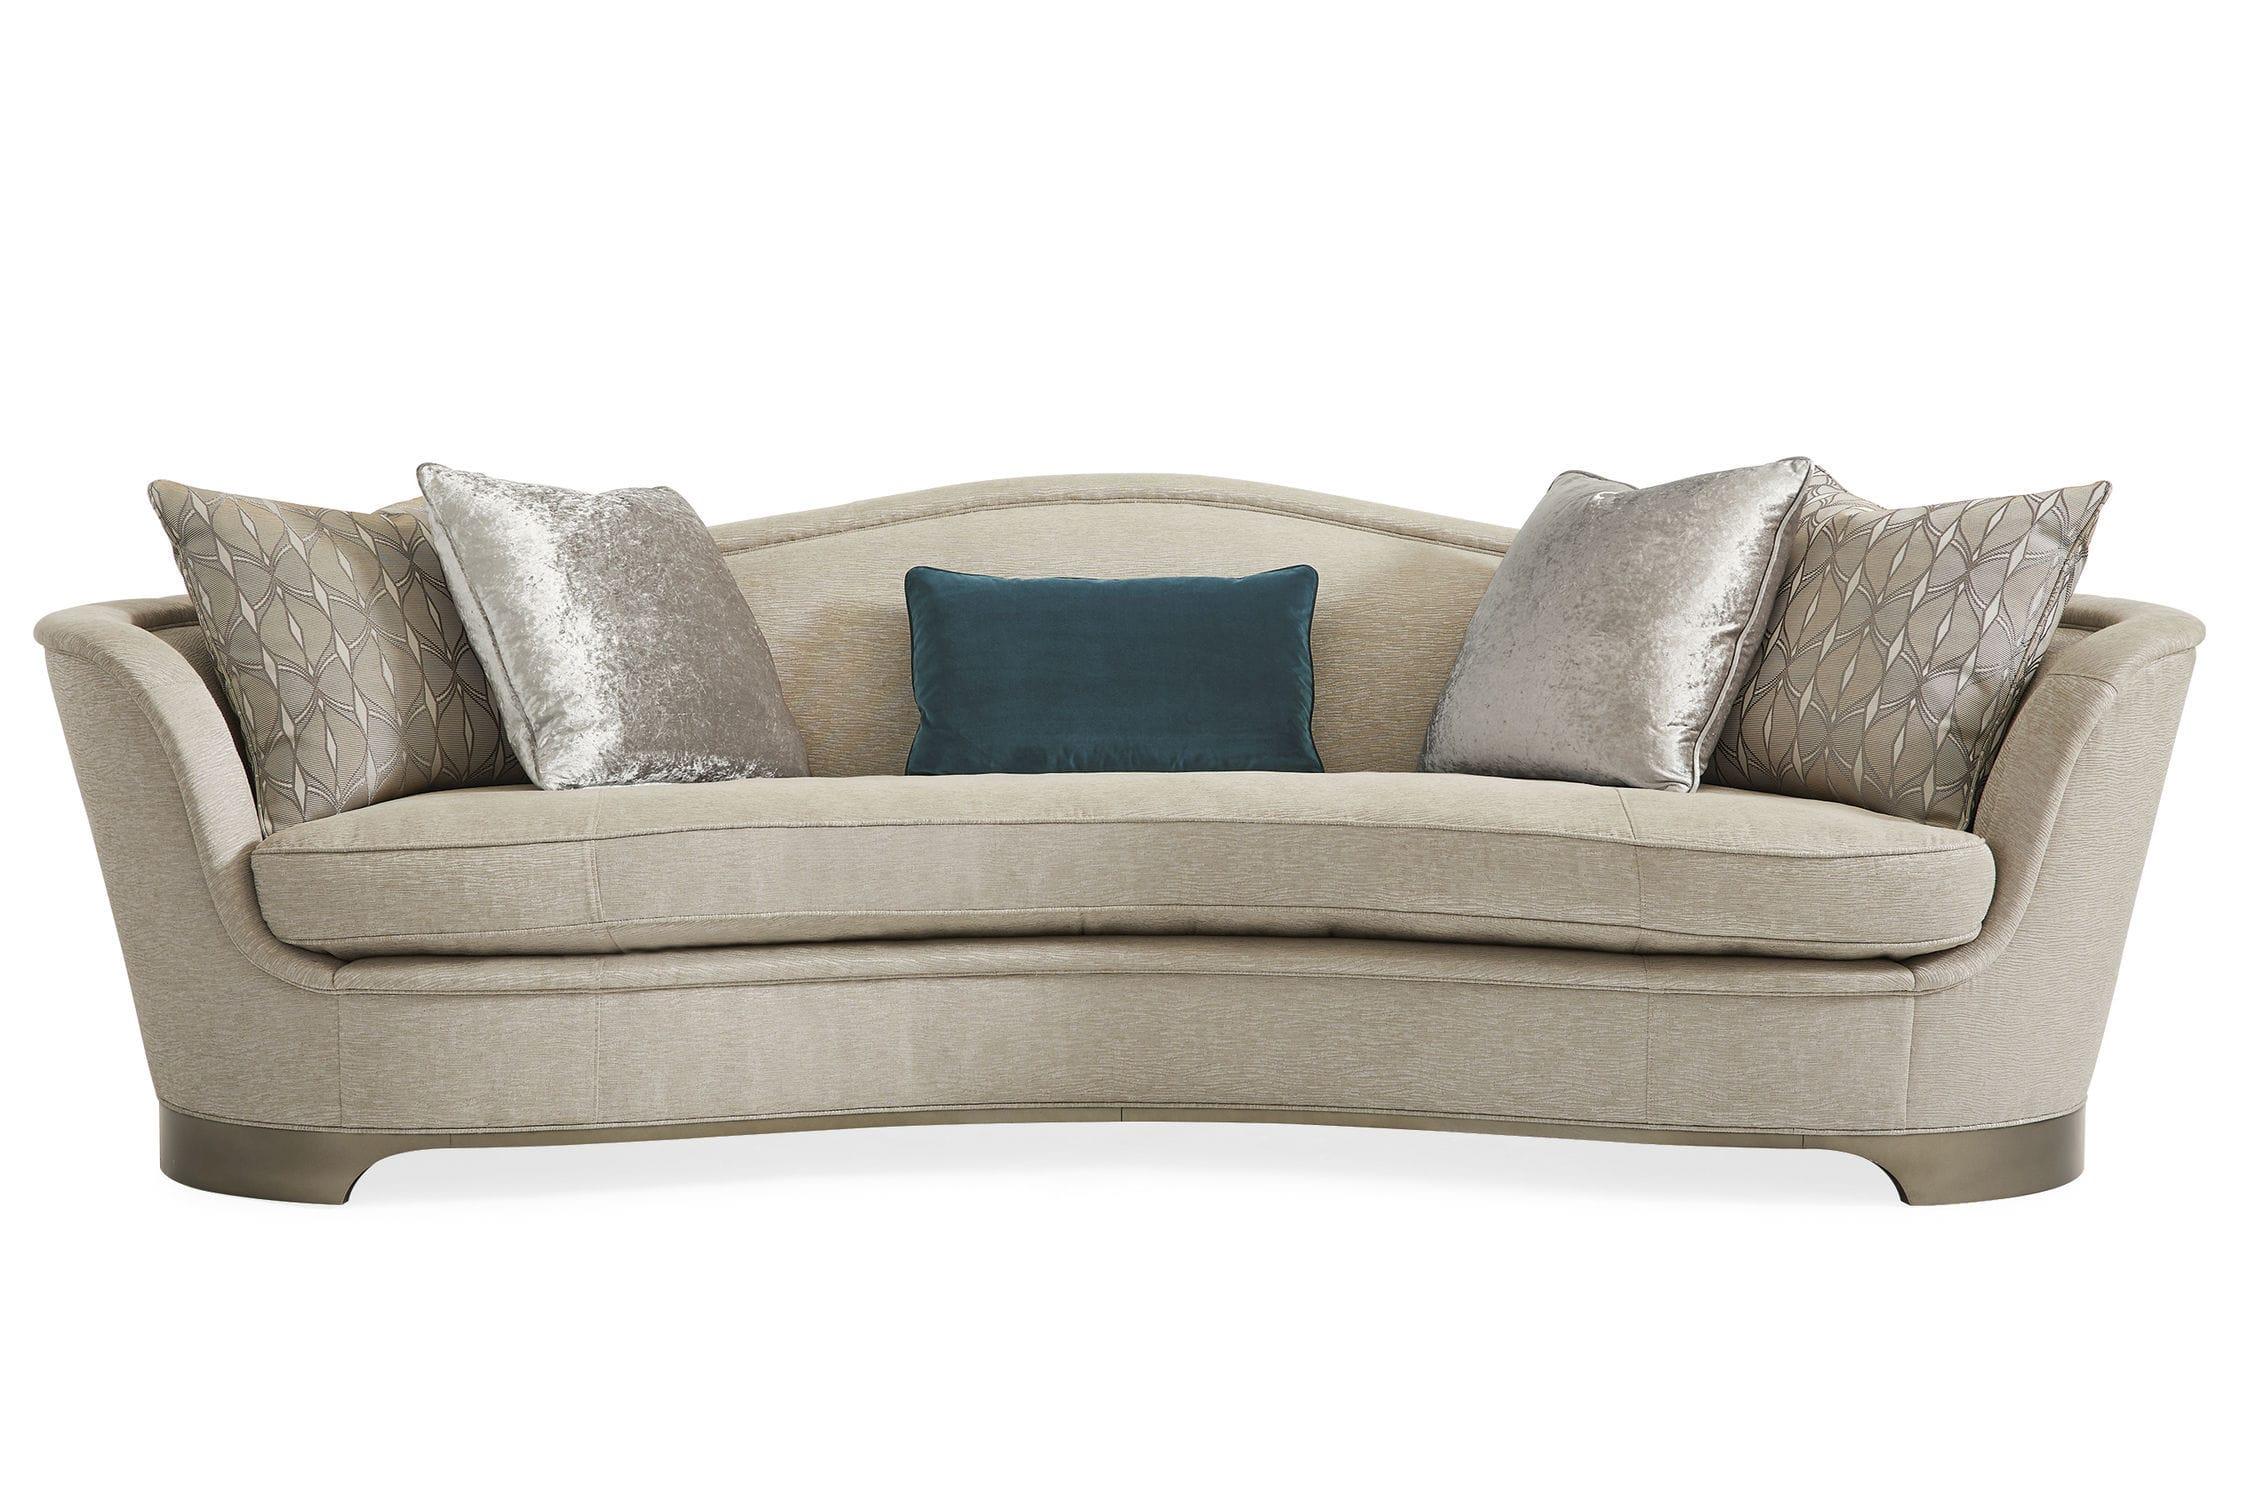 Full Size of Halbrundes Sofa Art Deco Stoff Kissen Caracole Upholstery Big Xxl Chesterfield Günstig Mit Relaxfunktion 3 Sitzer 2 Landhaus Dauerschläfer Led Zweisitzer Sofa Halbrundes Sofa